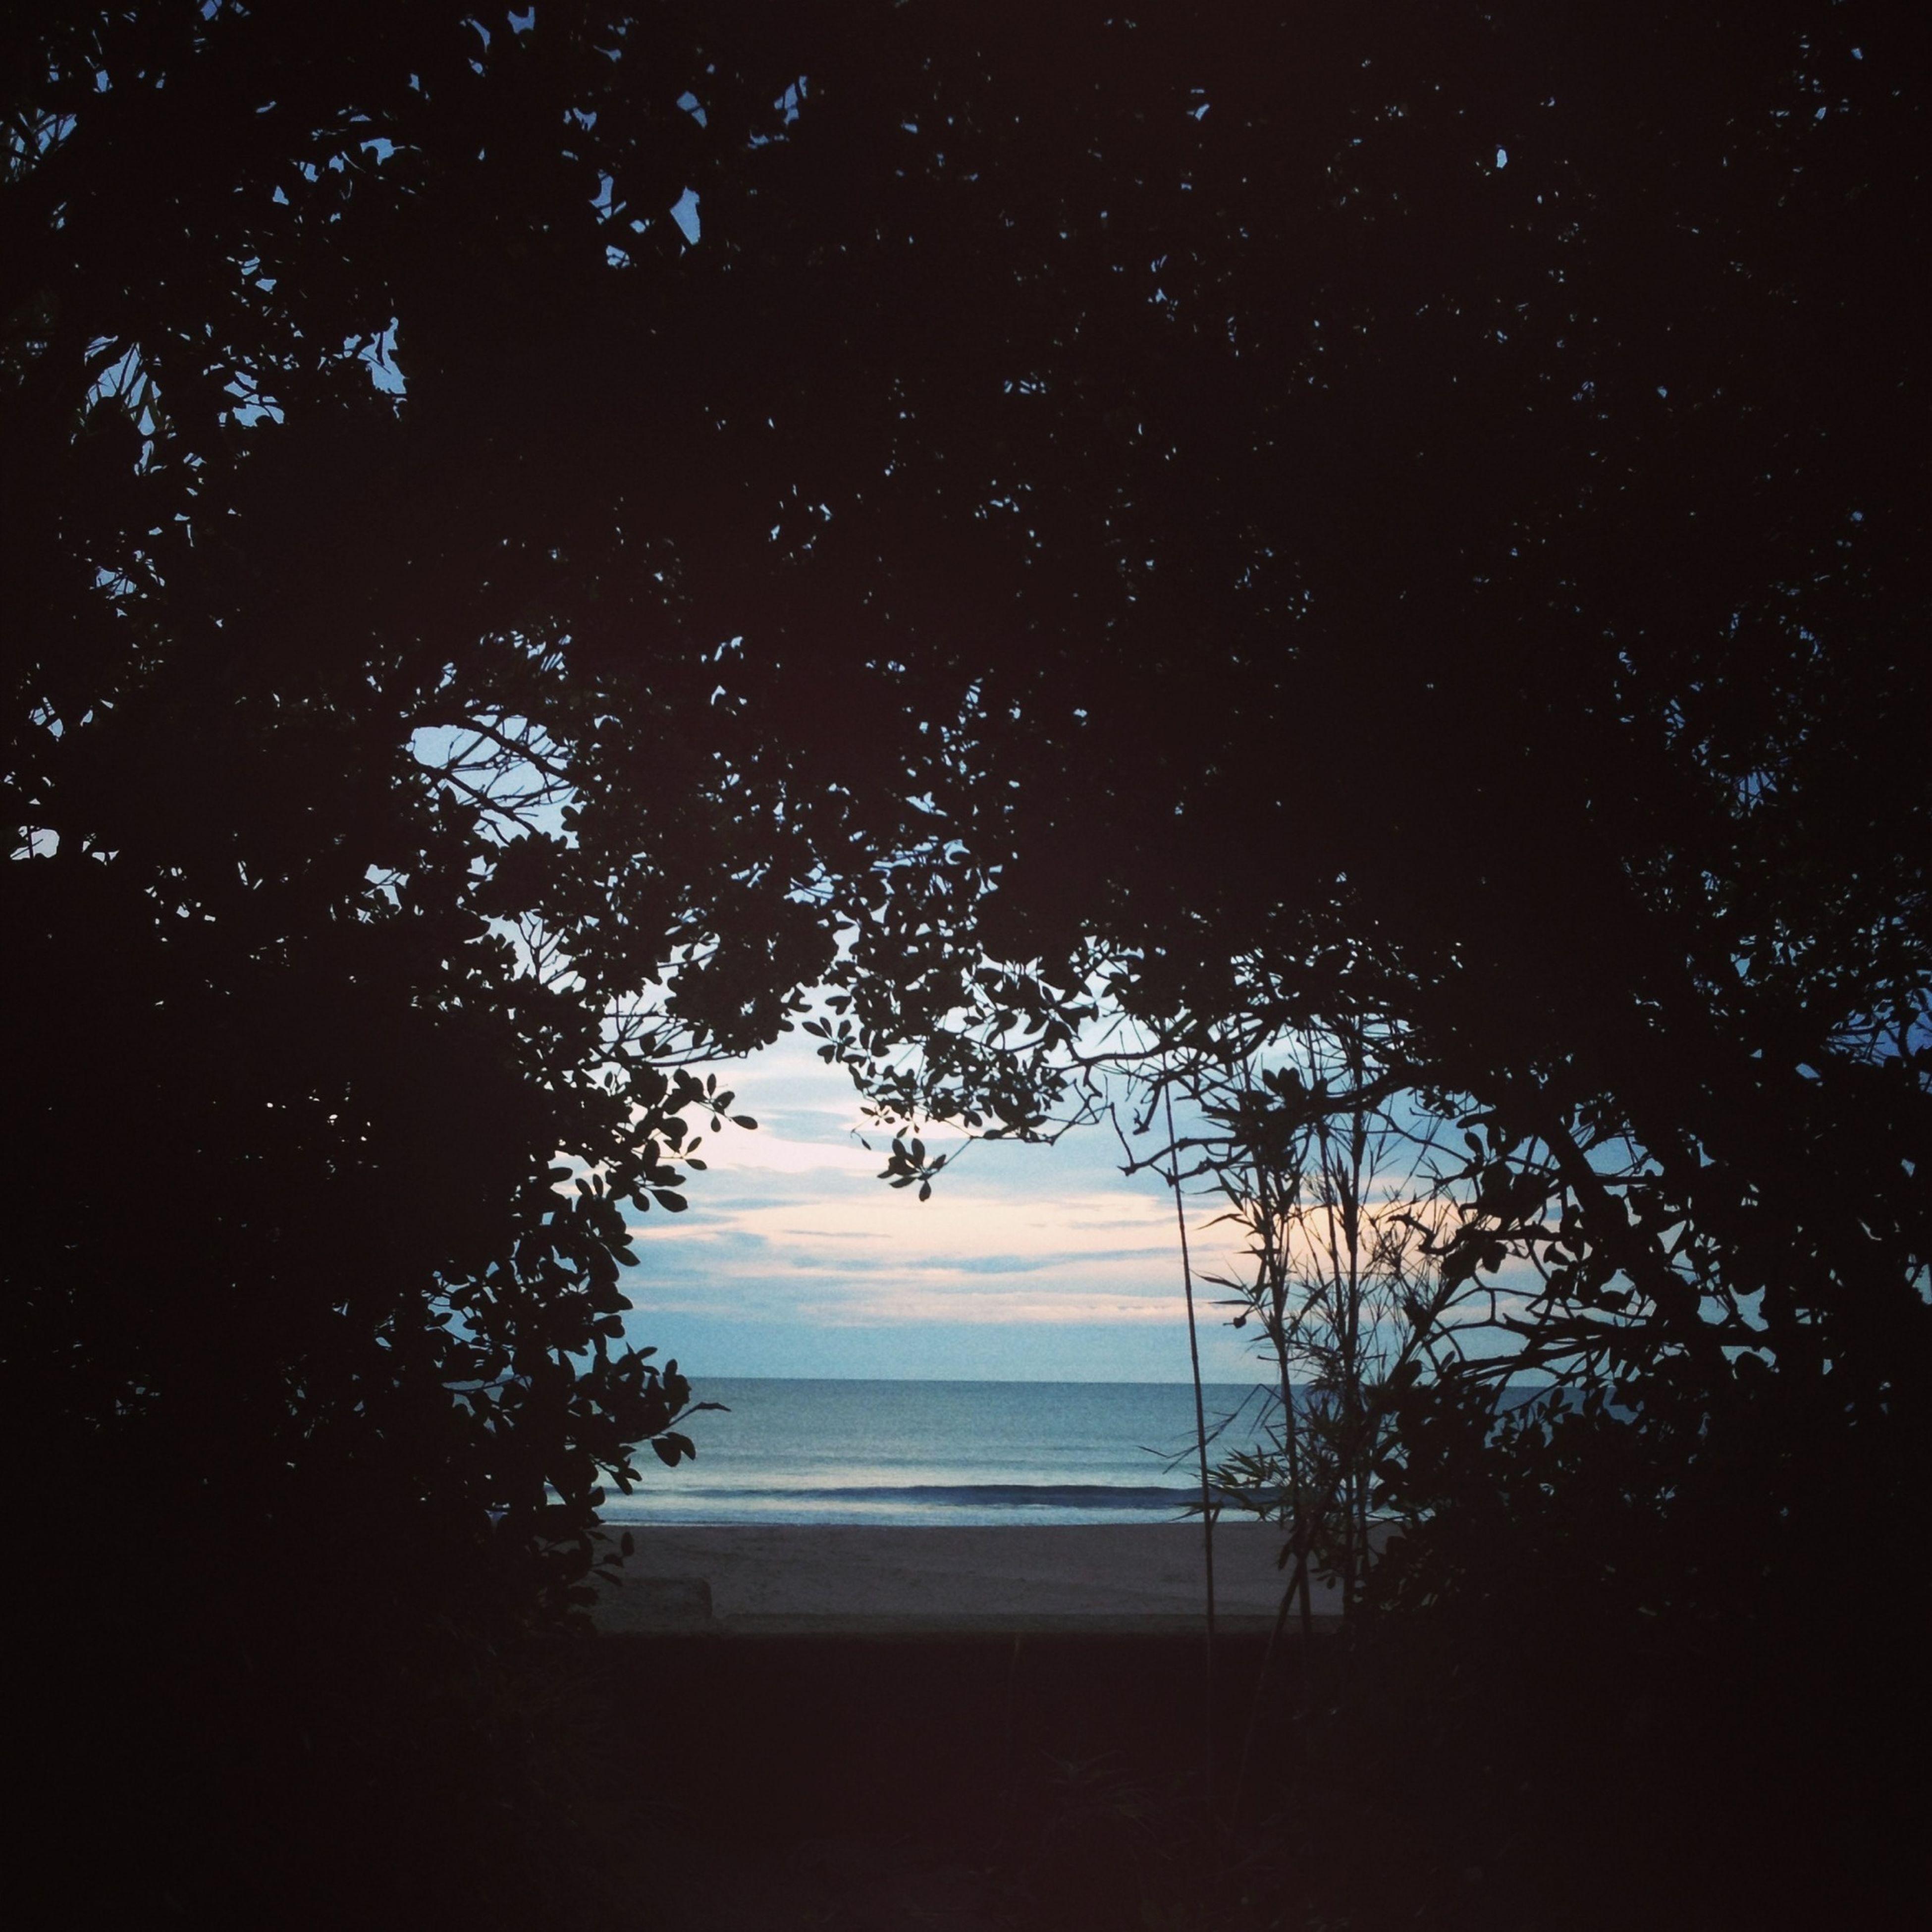 tree, tranquility, tranquil scene, scenics, beauty in nature, water, nature, sea, horizon over water, sky, silhouette, idyllic, beach, outdoors, branch, no people, non-urban scene, night, dark, growth